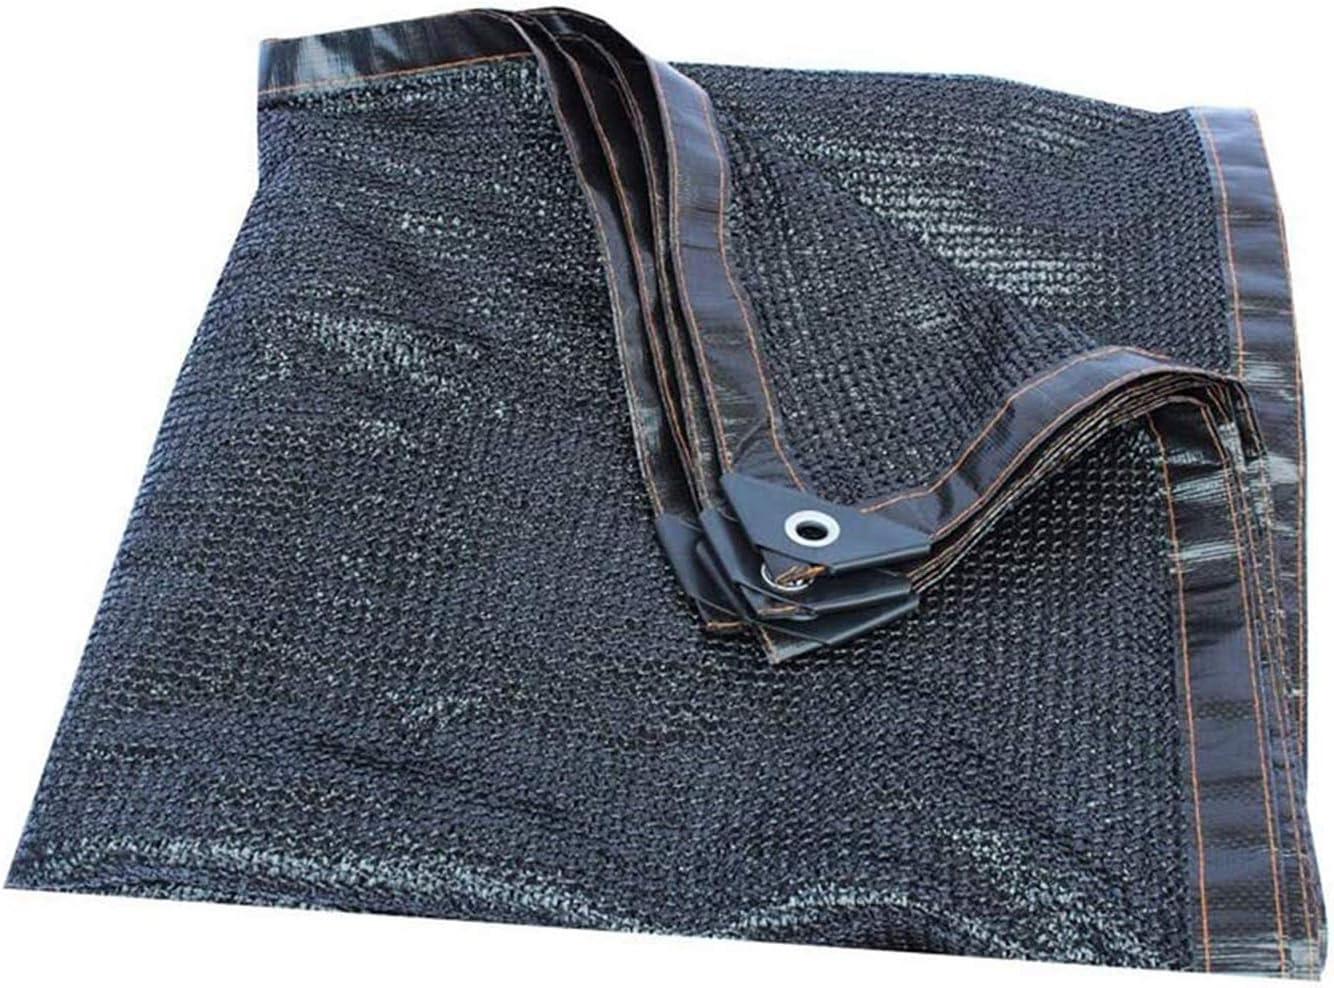 SSHA In a popularity Shade Cloth Net 90% Mesh Sun Sunblock Ne National products